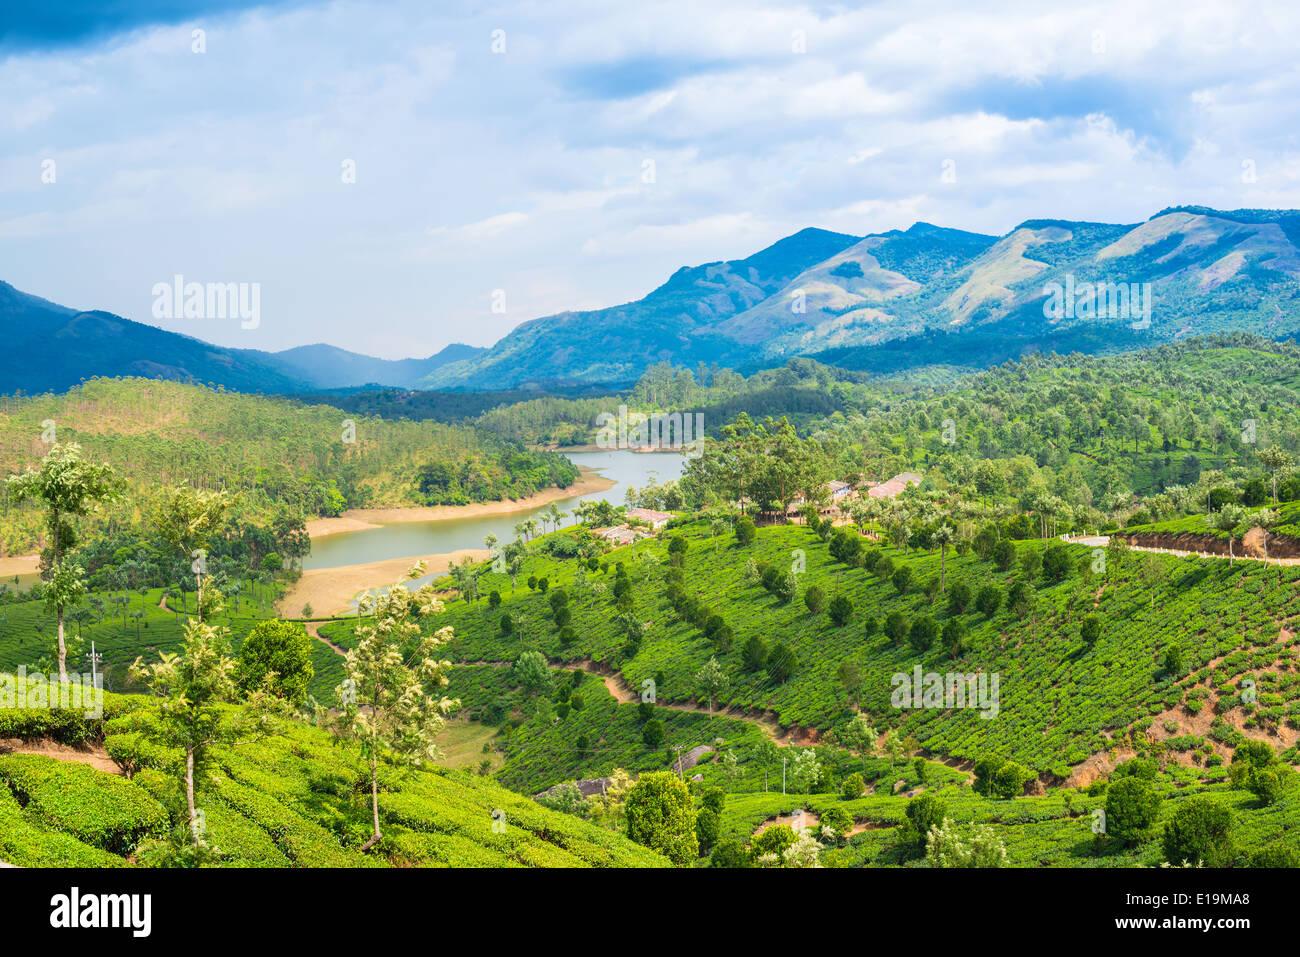 Beautiful Tea Plantations Landscape Vivid View Stock Photo ...